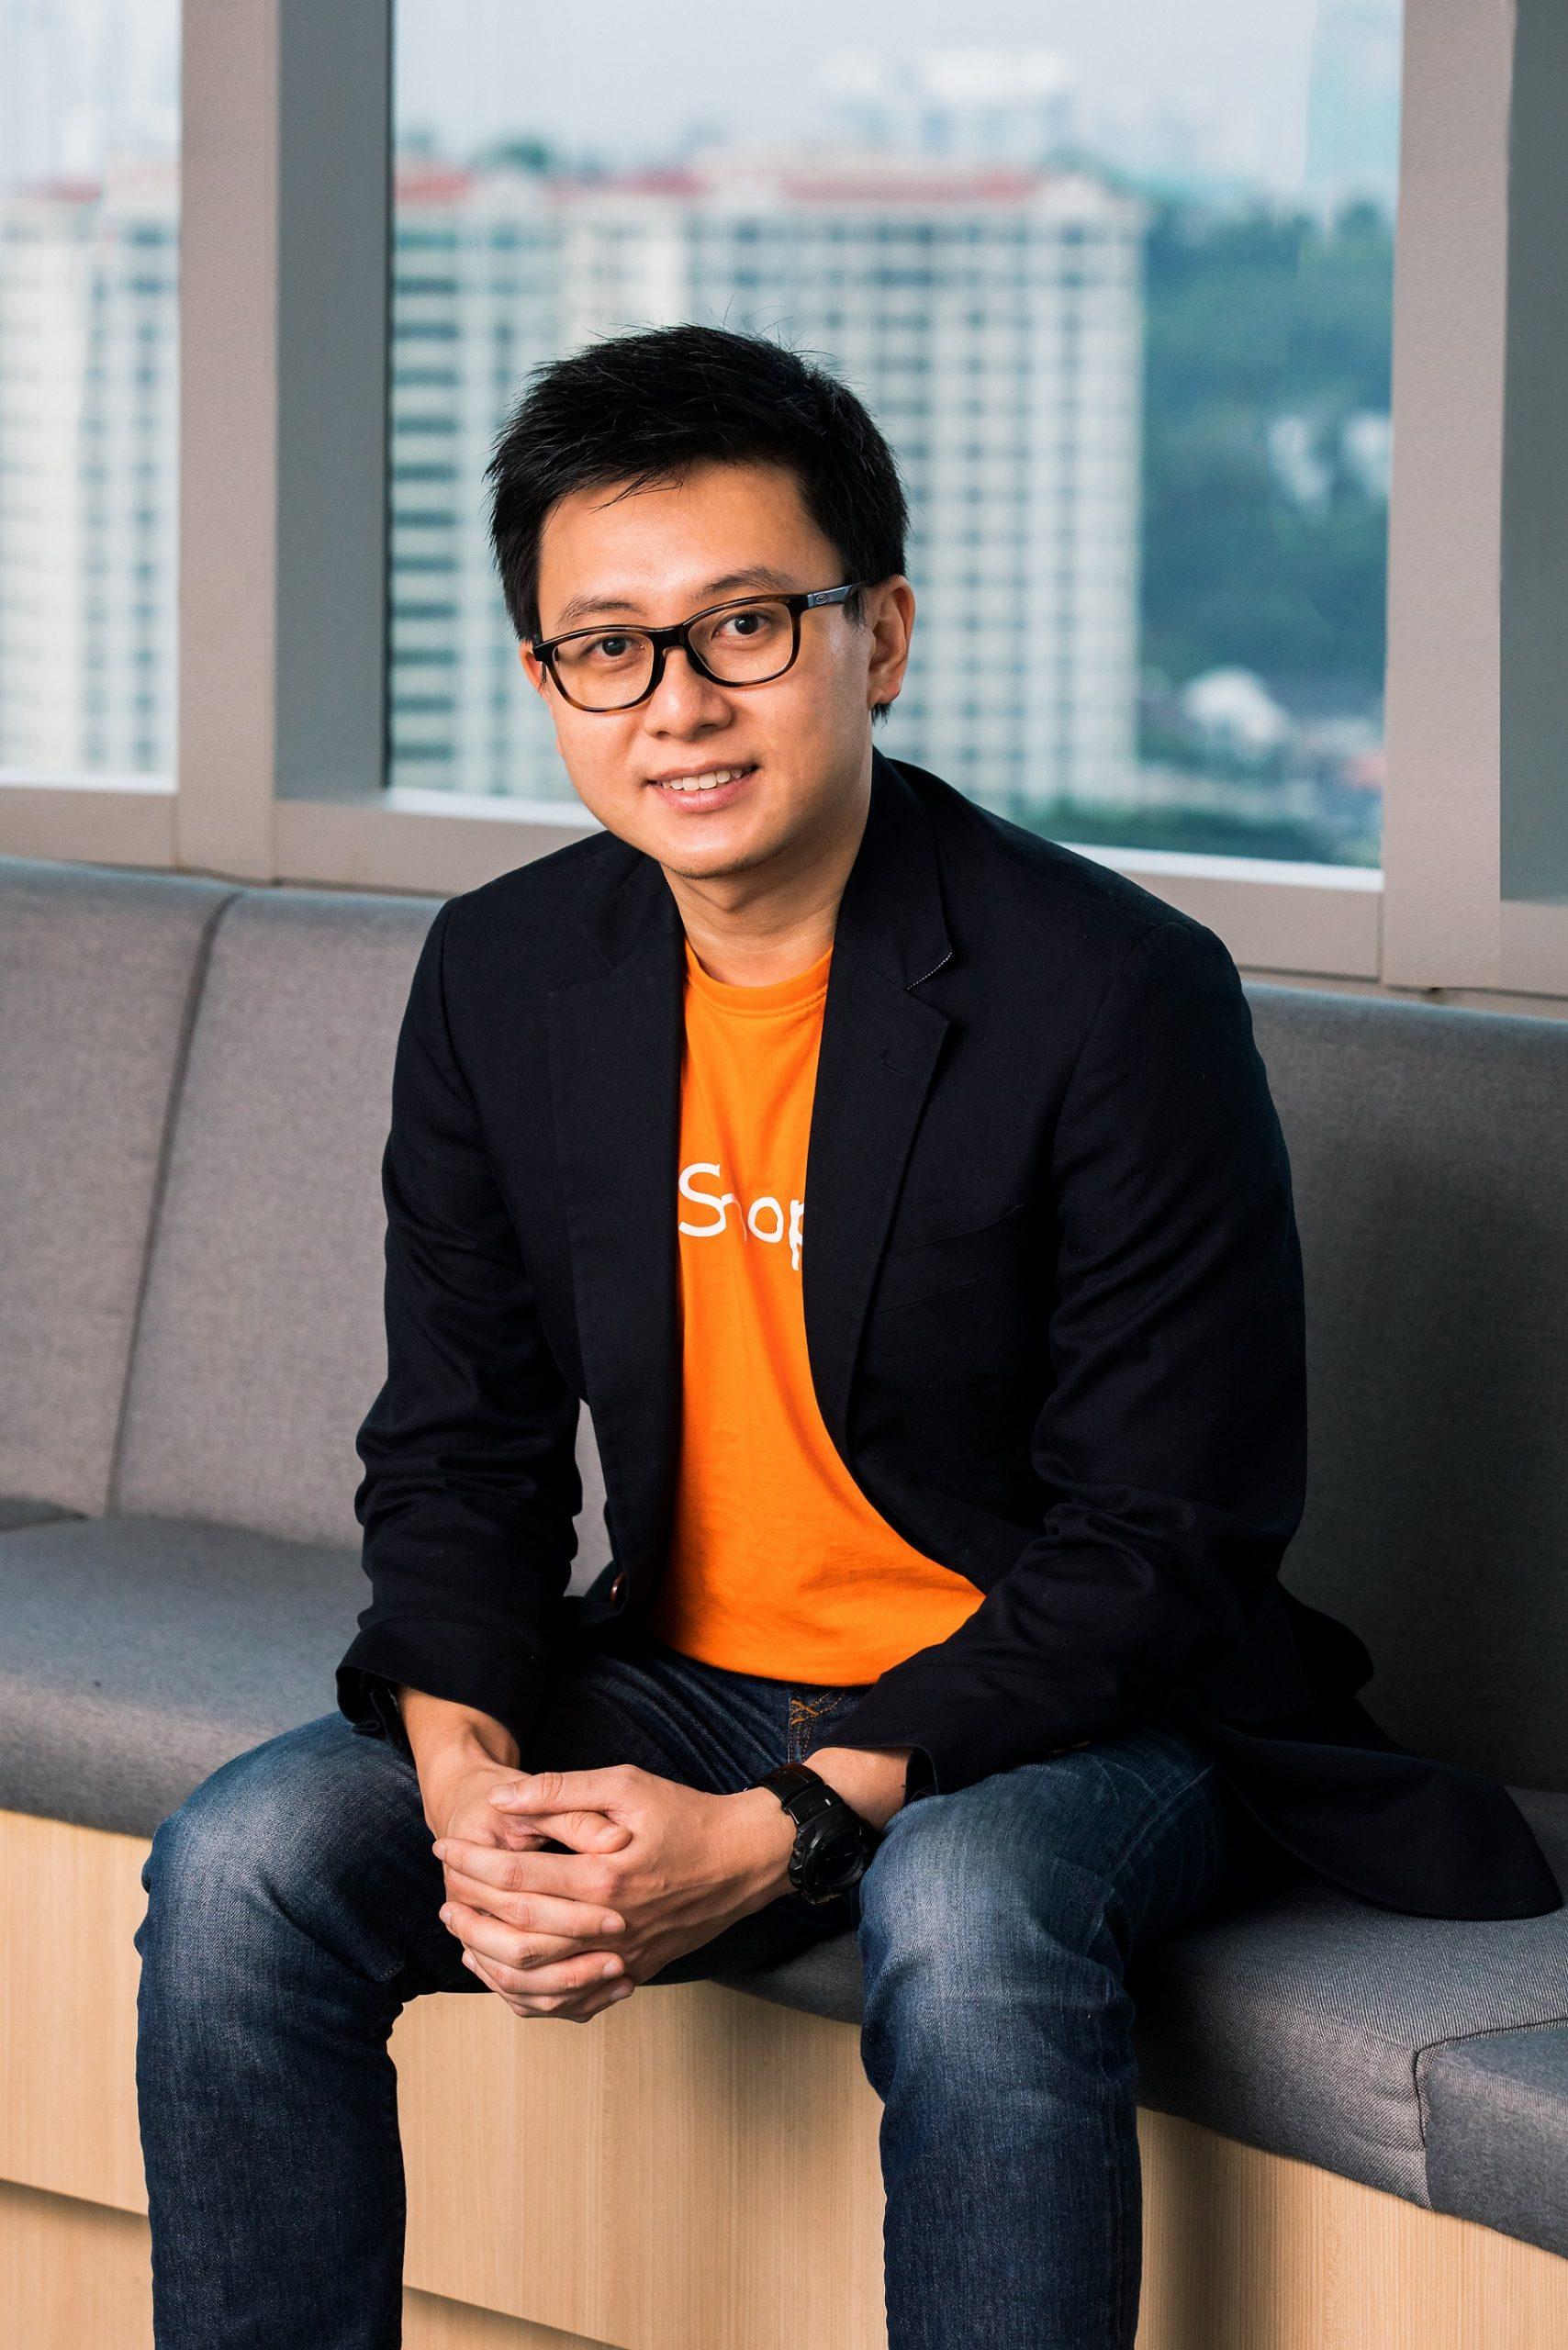 Alain Yee, Head of ShopeePay Malaysia. Photo by ShopeePay Malaysia/Press release